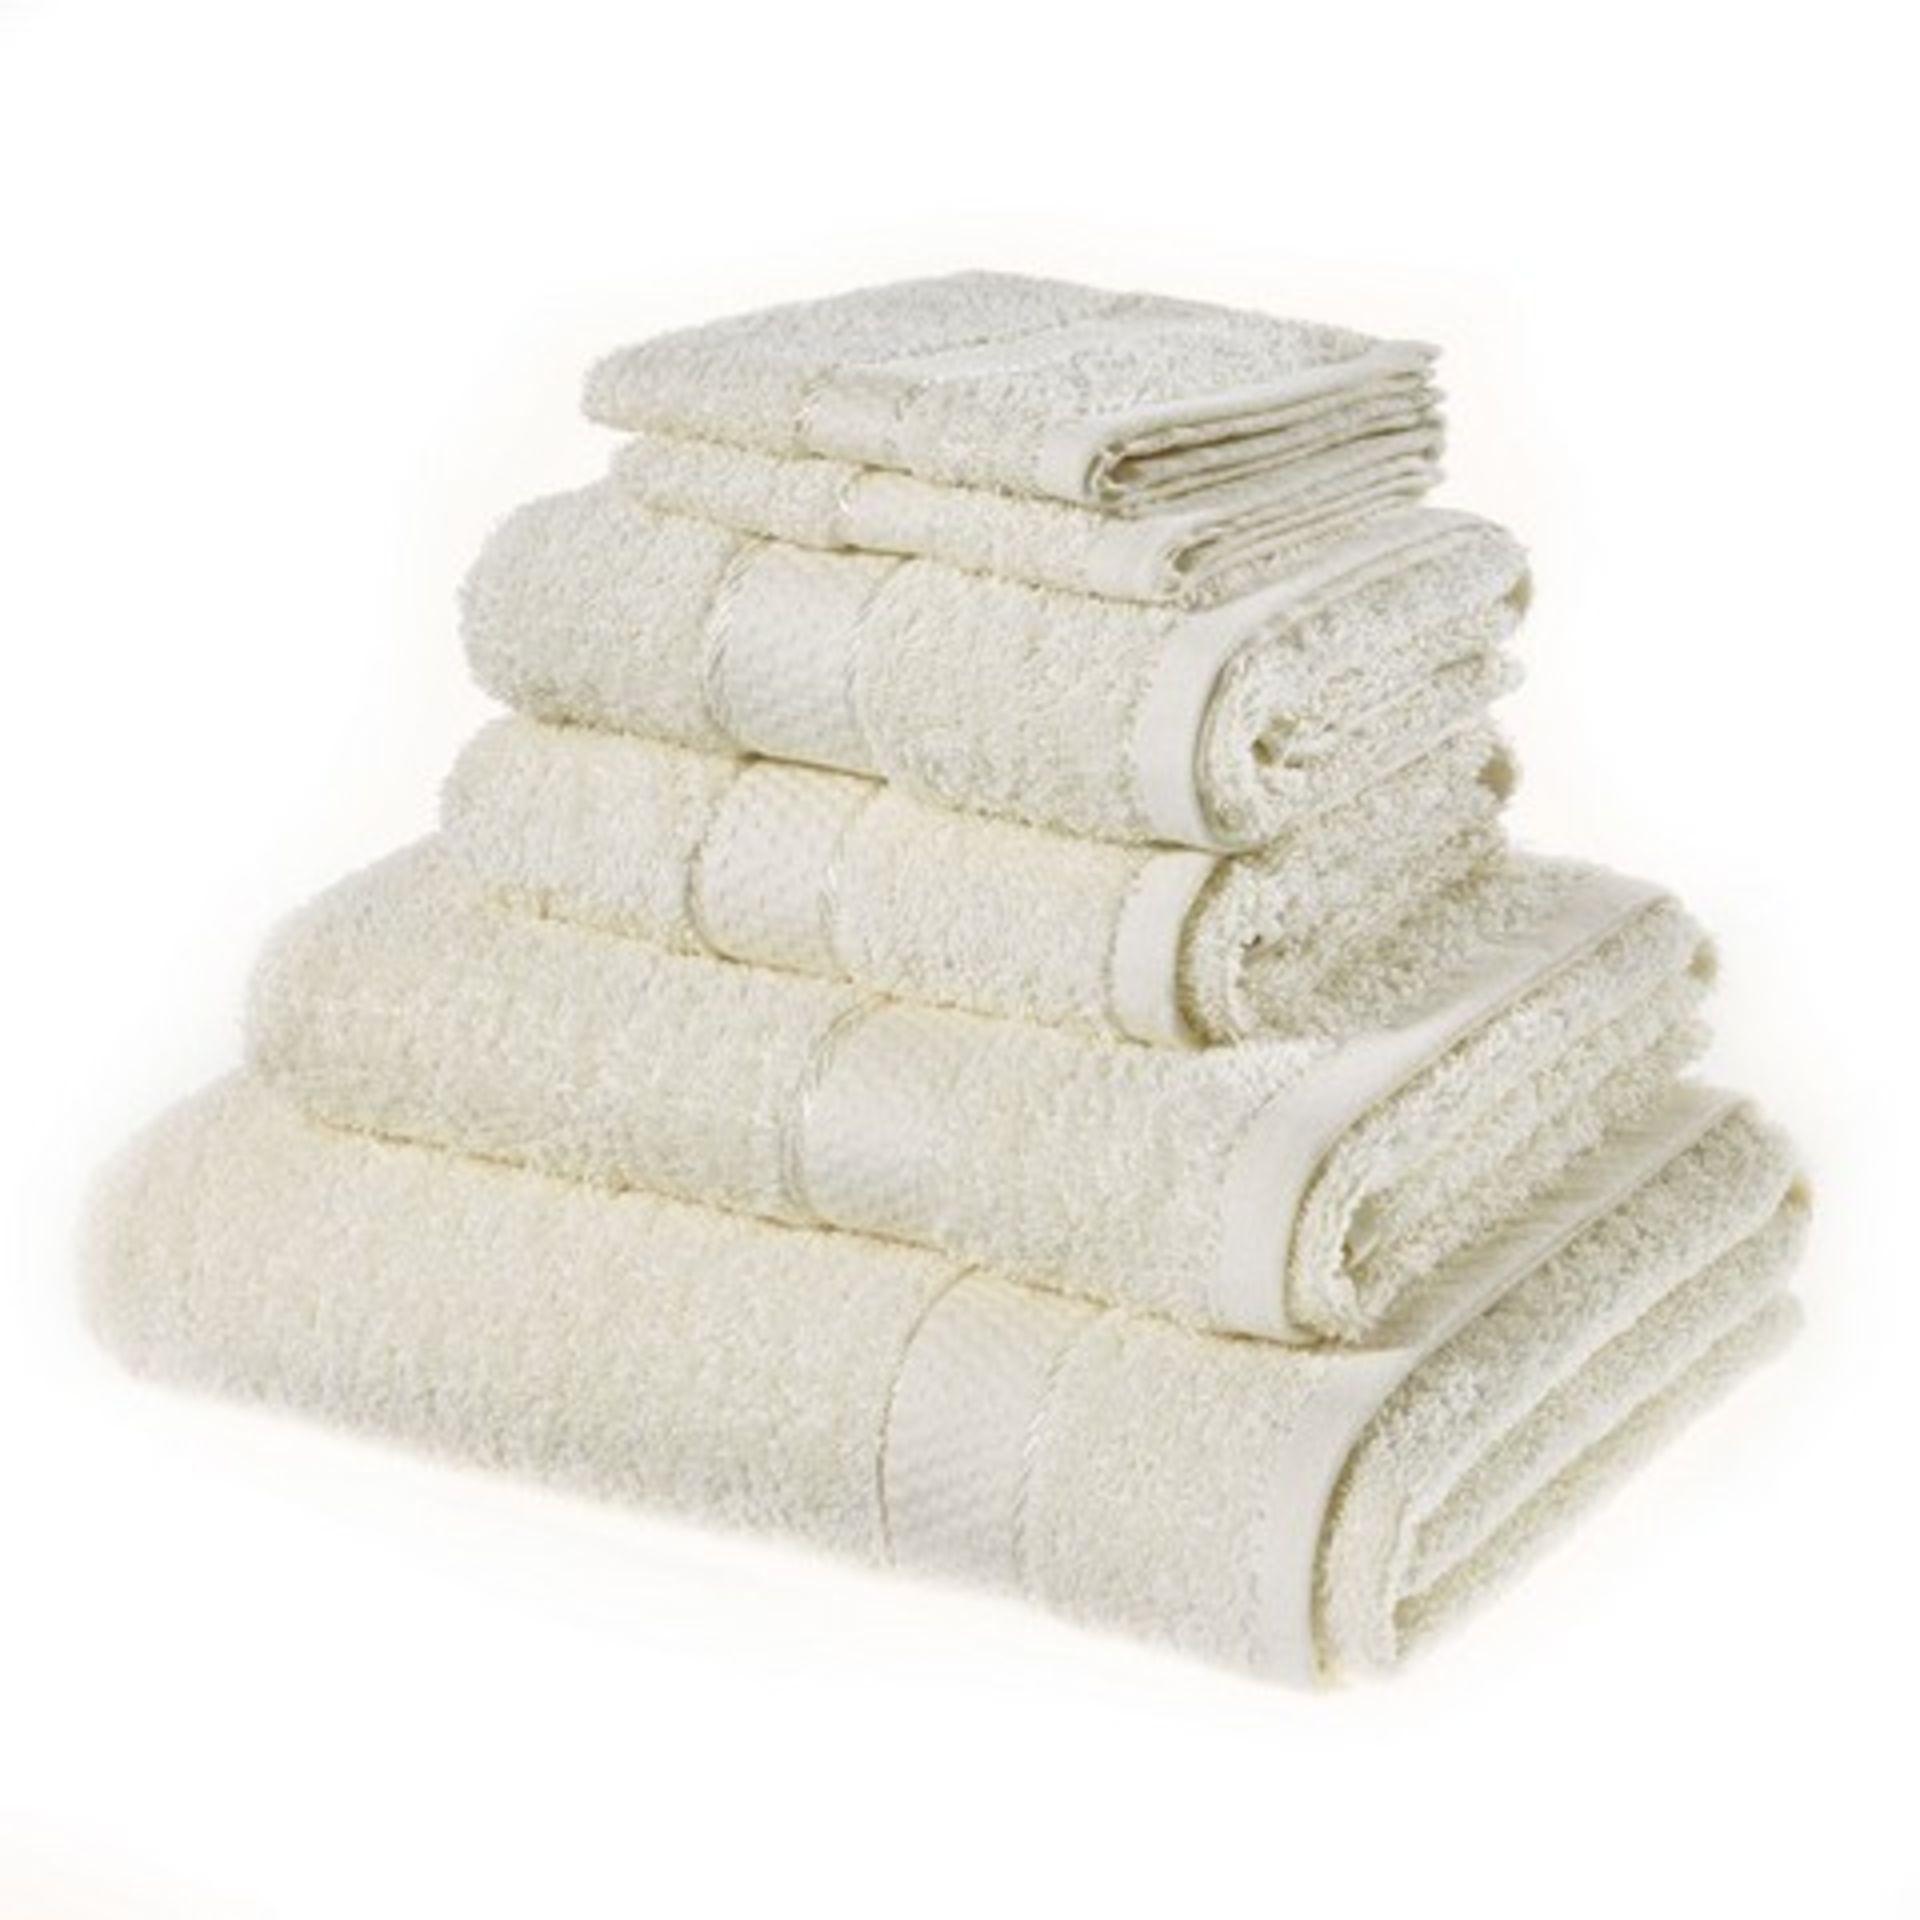 + VAT Brand New Cream 6 Piece Towel Bale Set With 2 Face Towels - 2 Hand Towels - 1 Bath Sheet - 1